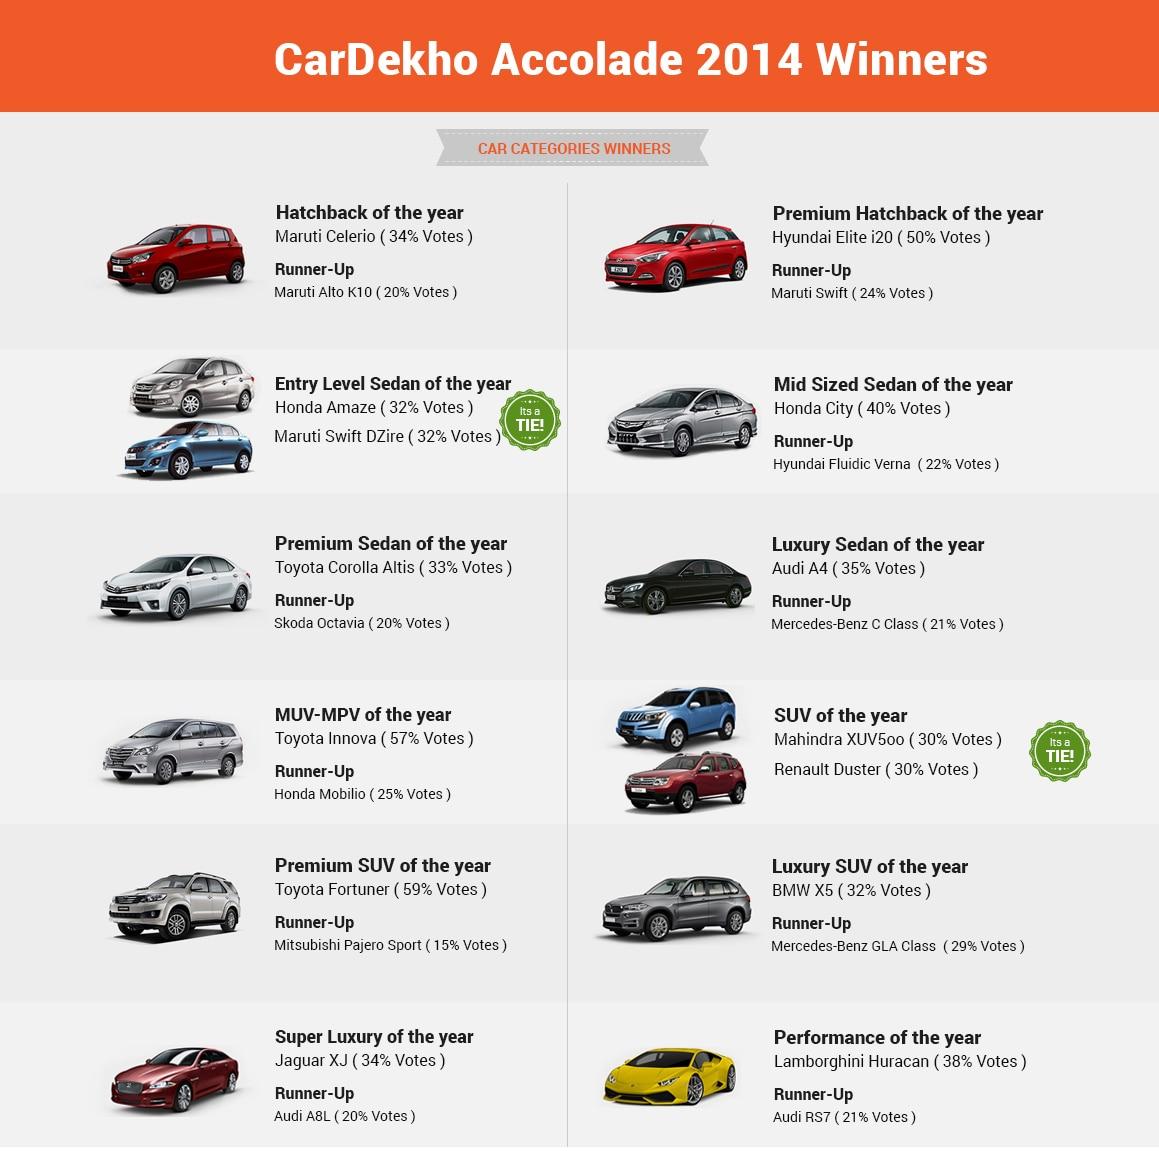 Luxury Car Brands List >> CarDekho.com announces winners of CarDekho Accolade 2014 | Business Standard News